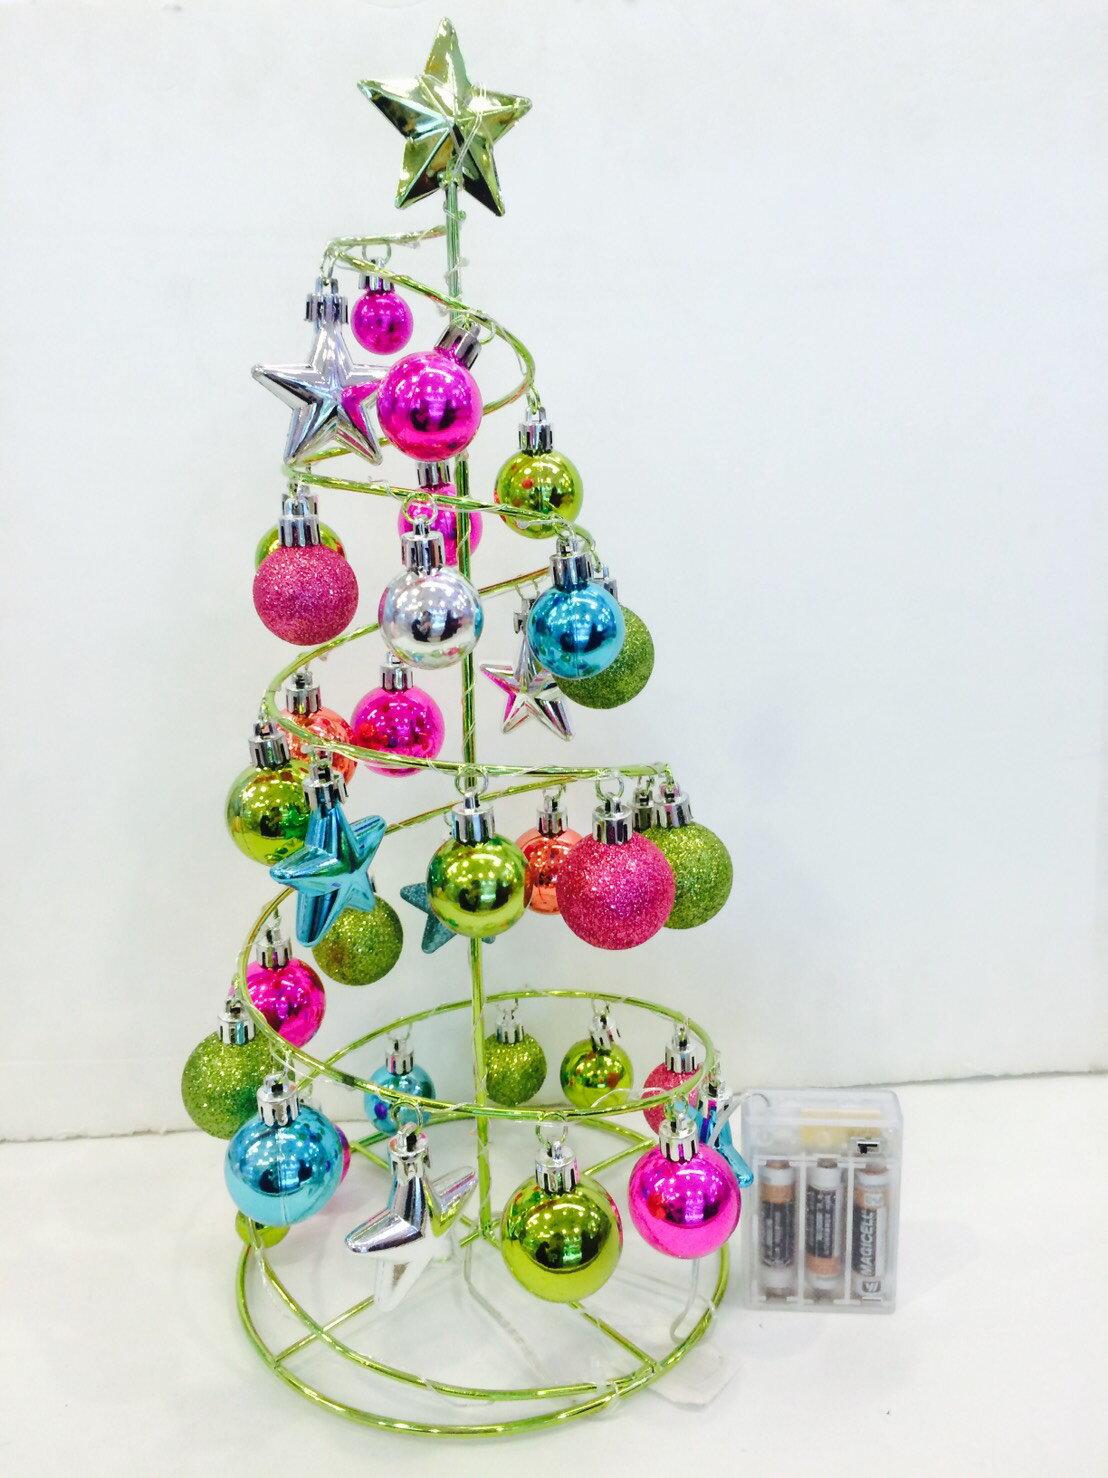 X射線【X170007】造型球鐵樹燈-綠,聖誕節/聖誕佈置/聖誕掛飾/聖誕裝飾/聖誕吊飾/聖誕花材/會場佈置/聖誕球